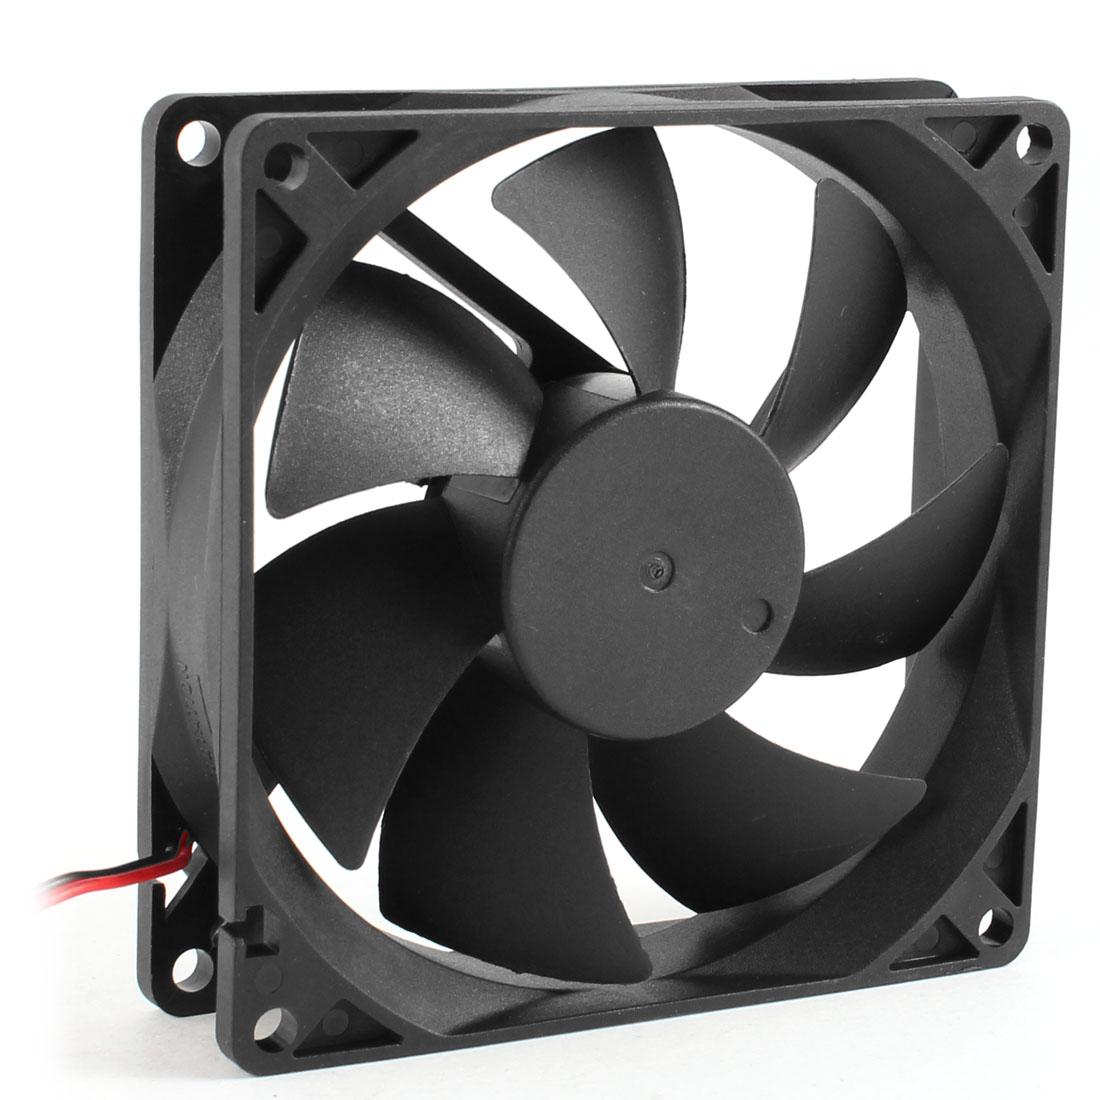 92mm x 25mm DC 12V 2 Terminal 65.01CFM PC Computer Case CPU Cooler Cooling Fan